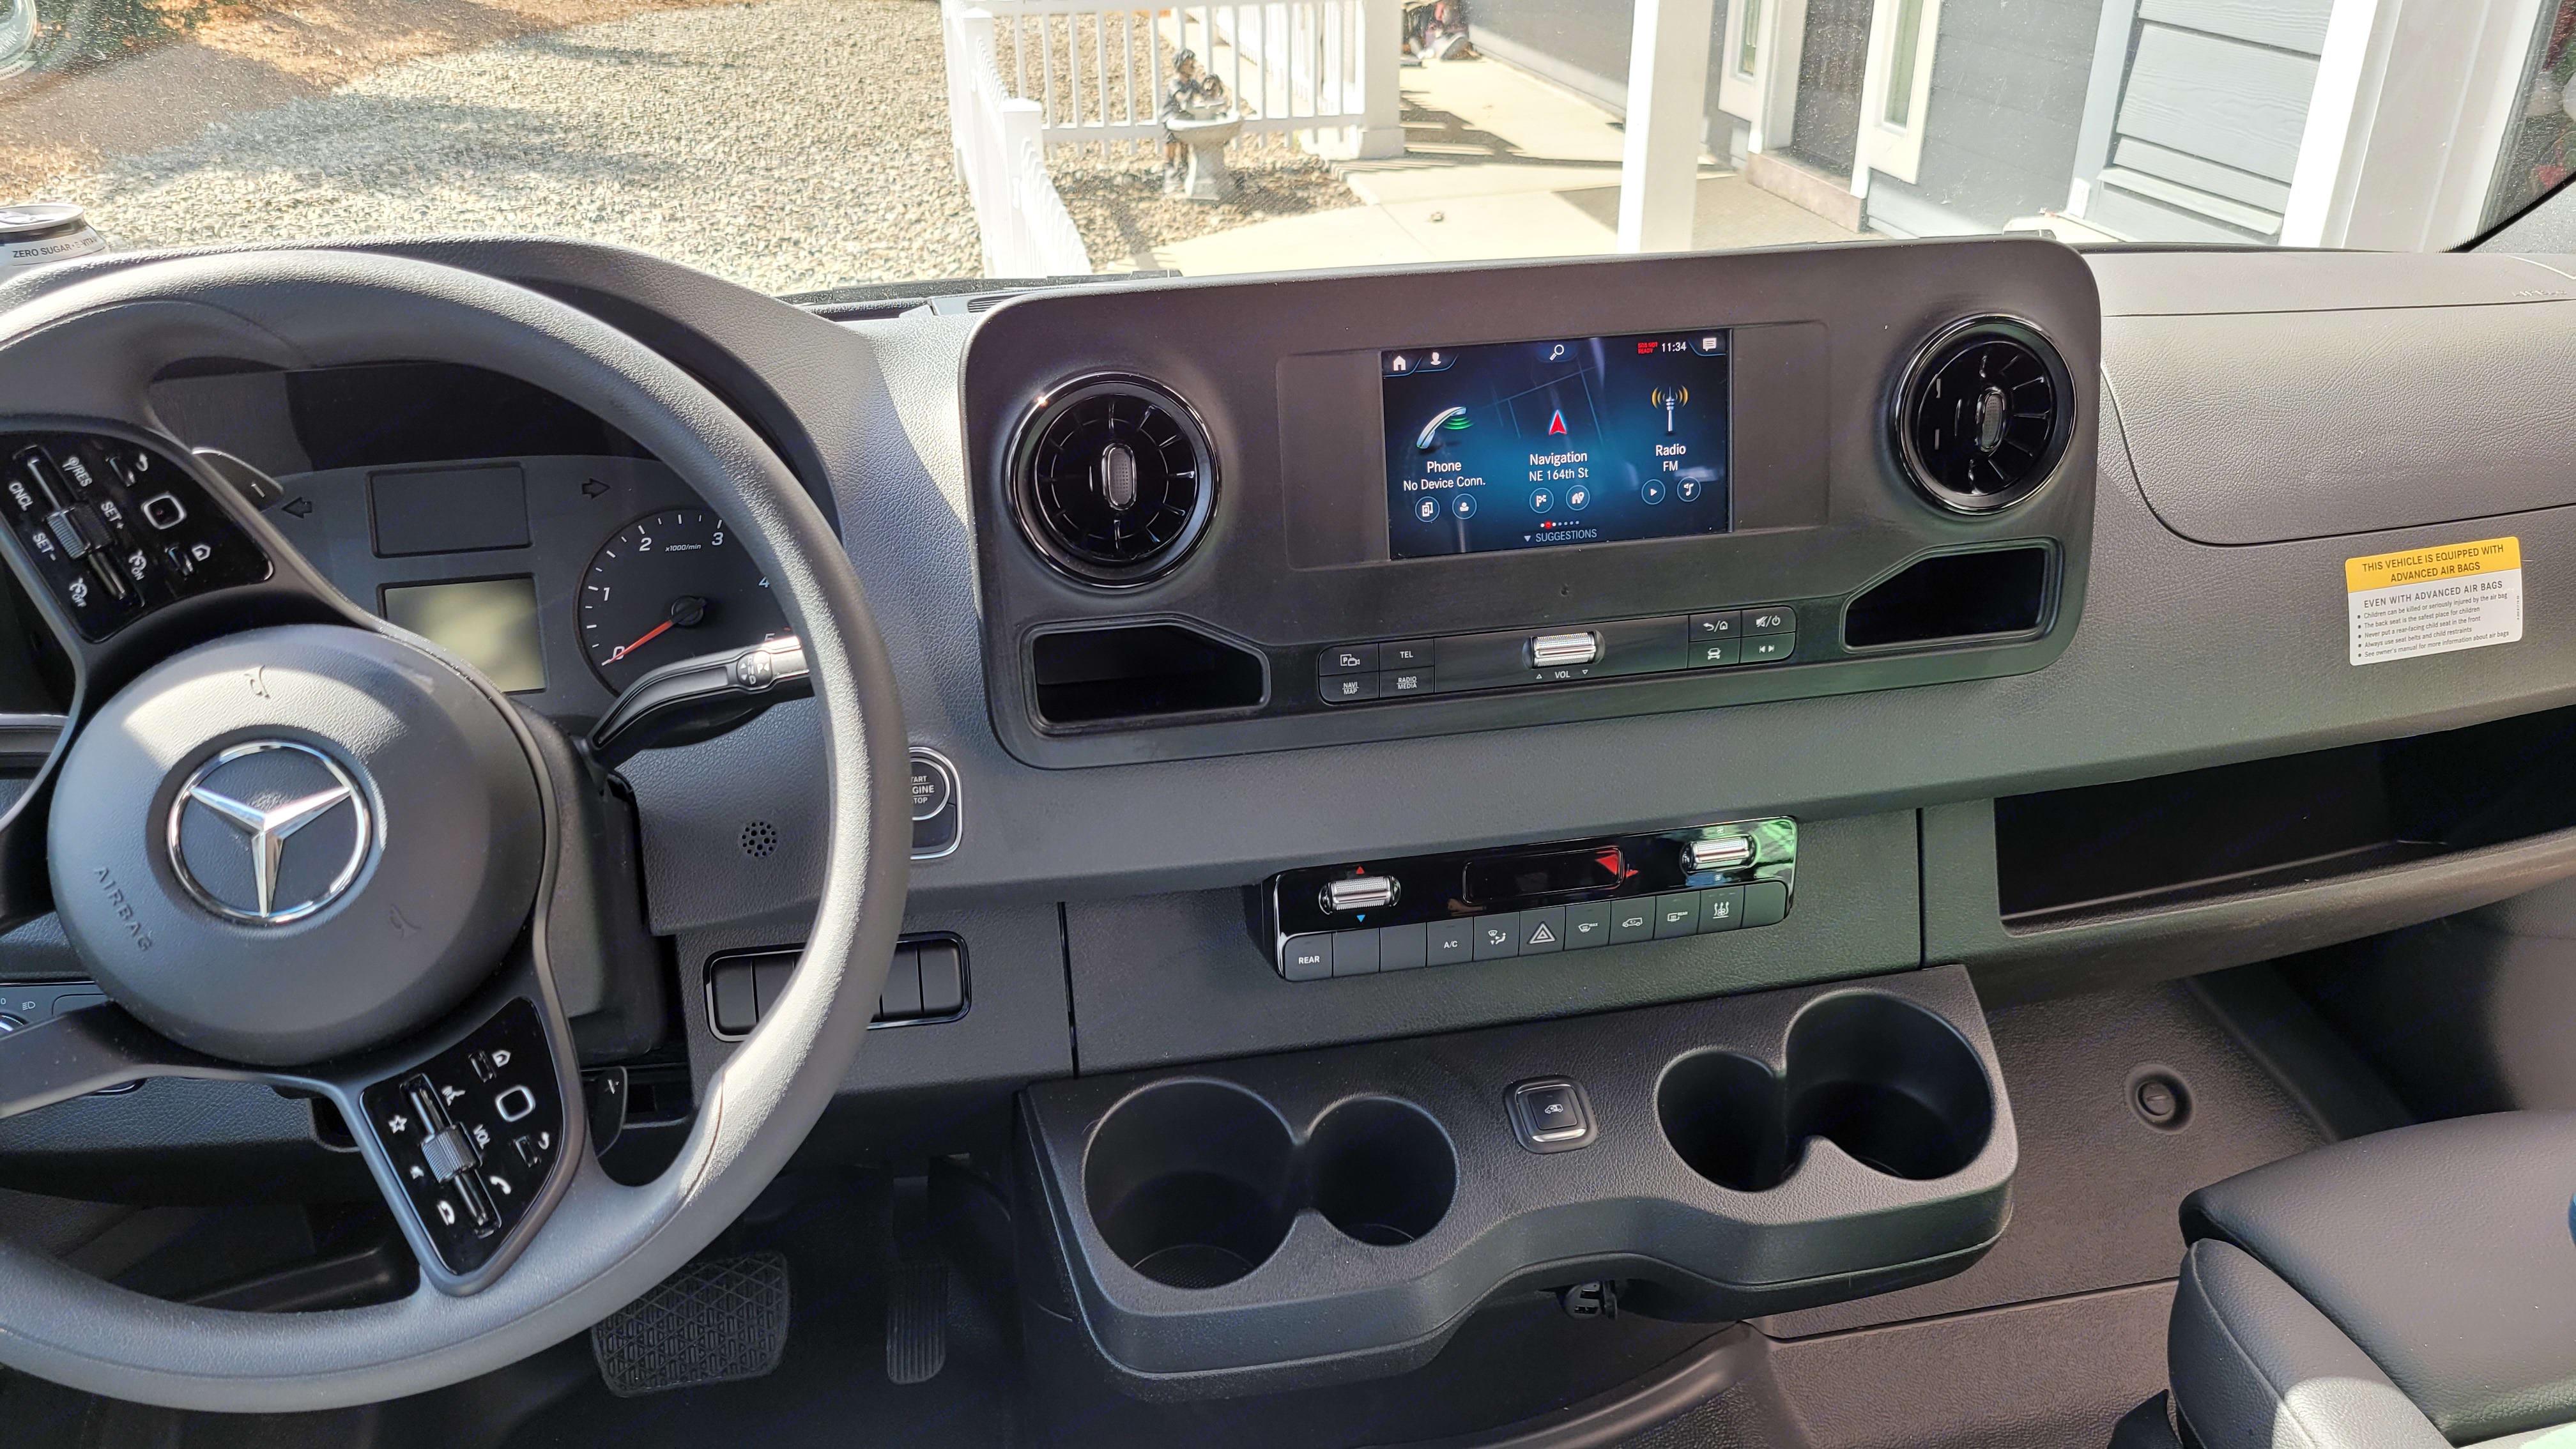 Mercedes-Benz Sprinter 2020